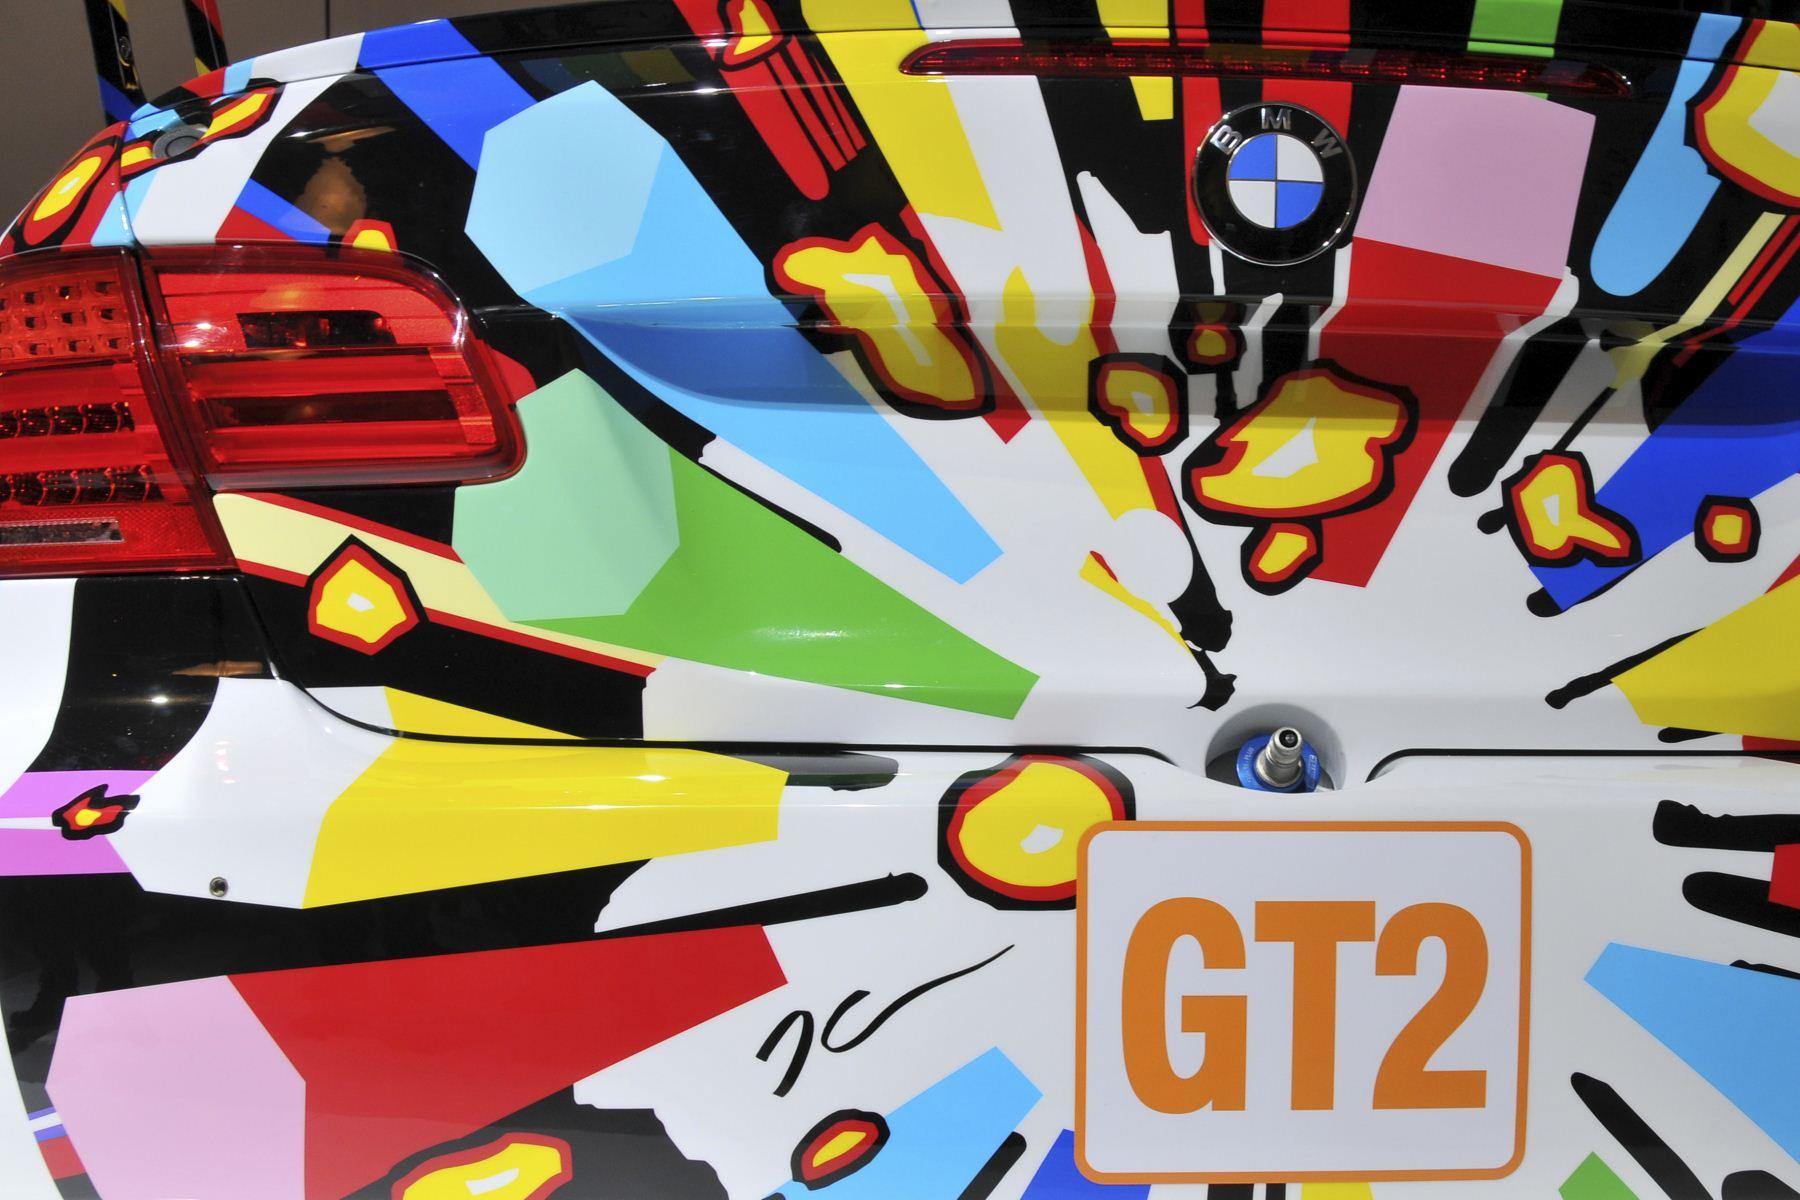 jeff koon bmw m3 gt2 art car 10